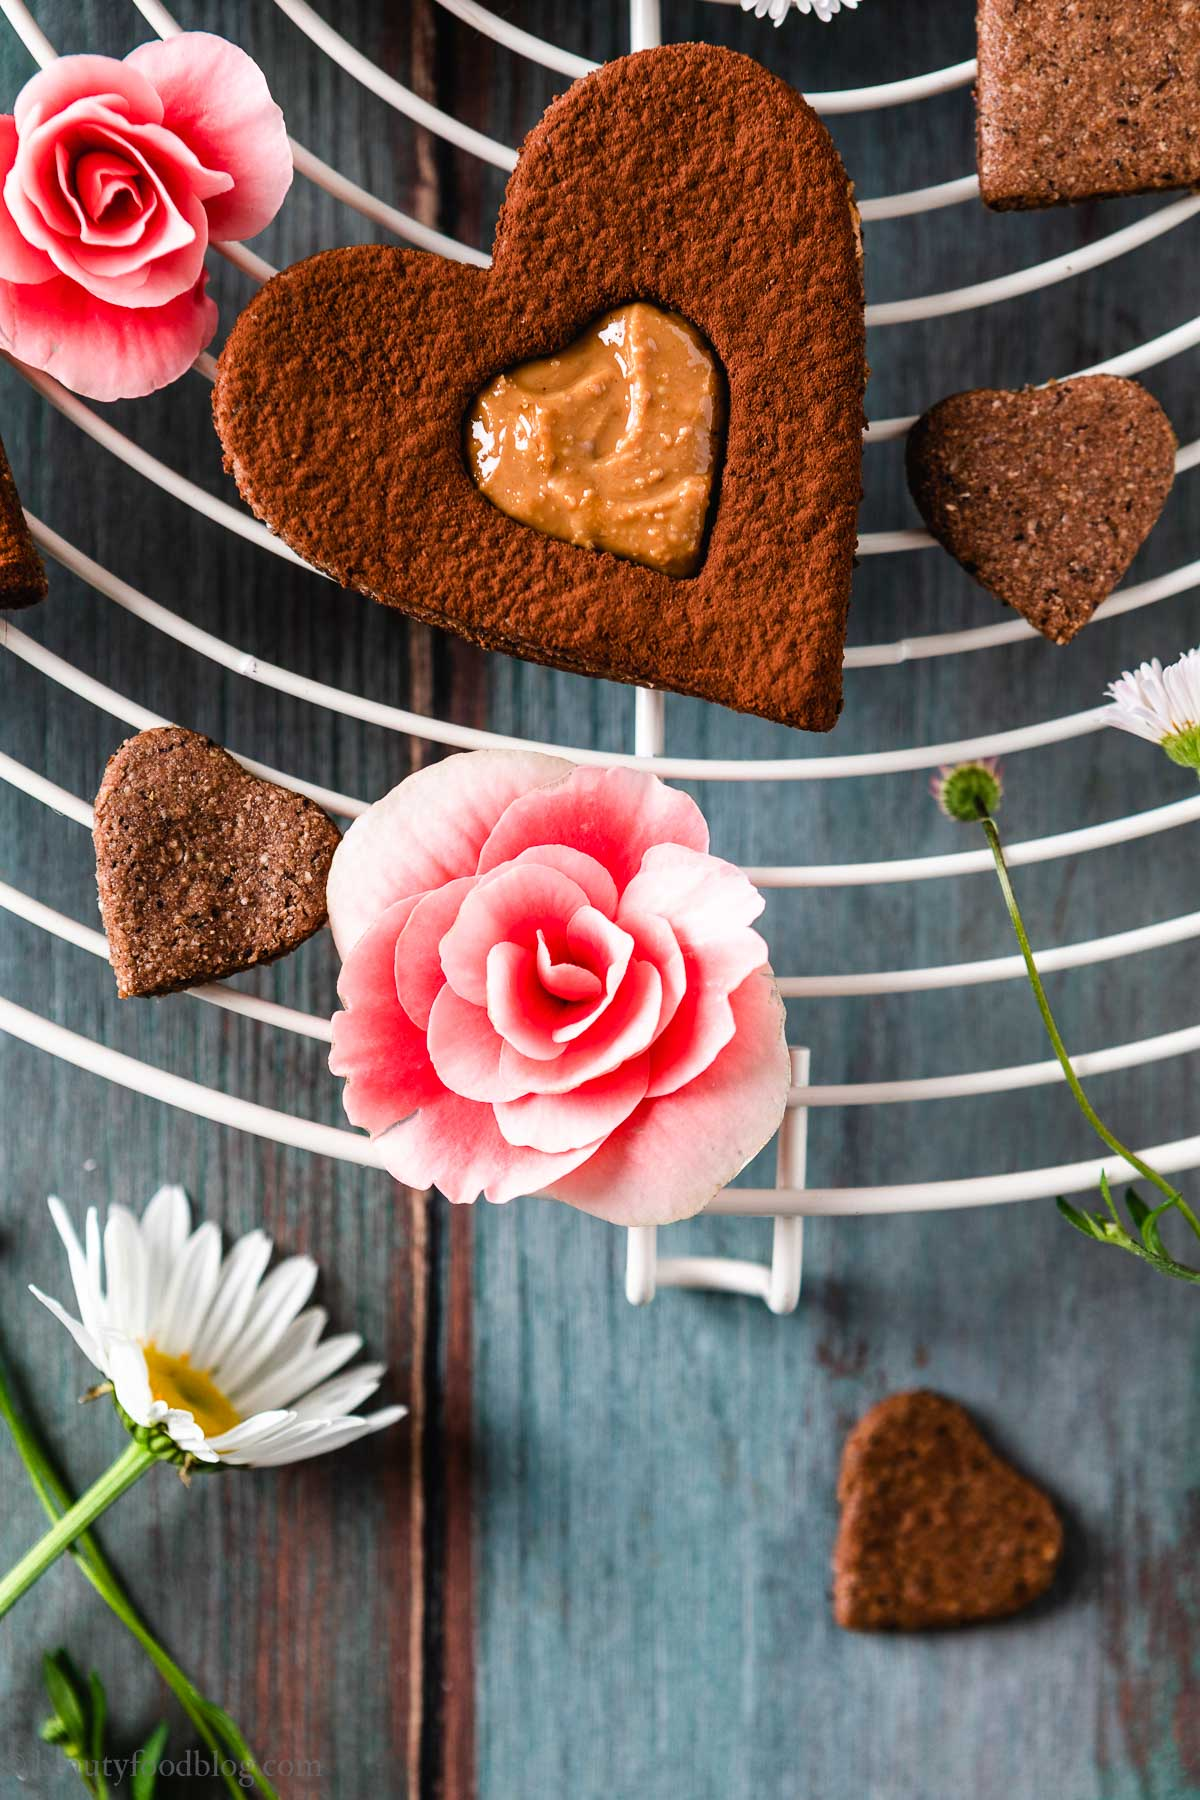 ricetta Frollini vegani senza glutine al cacao gluten-free vegan chocolate almond Linzer cookies valentines day